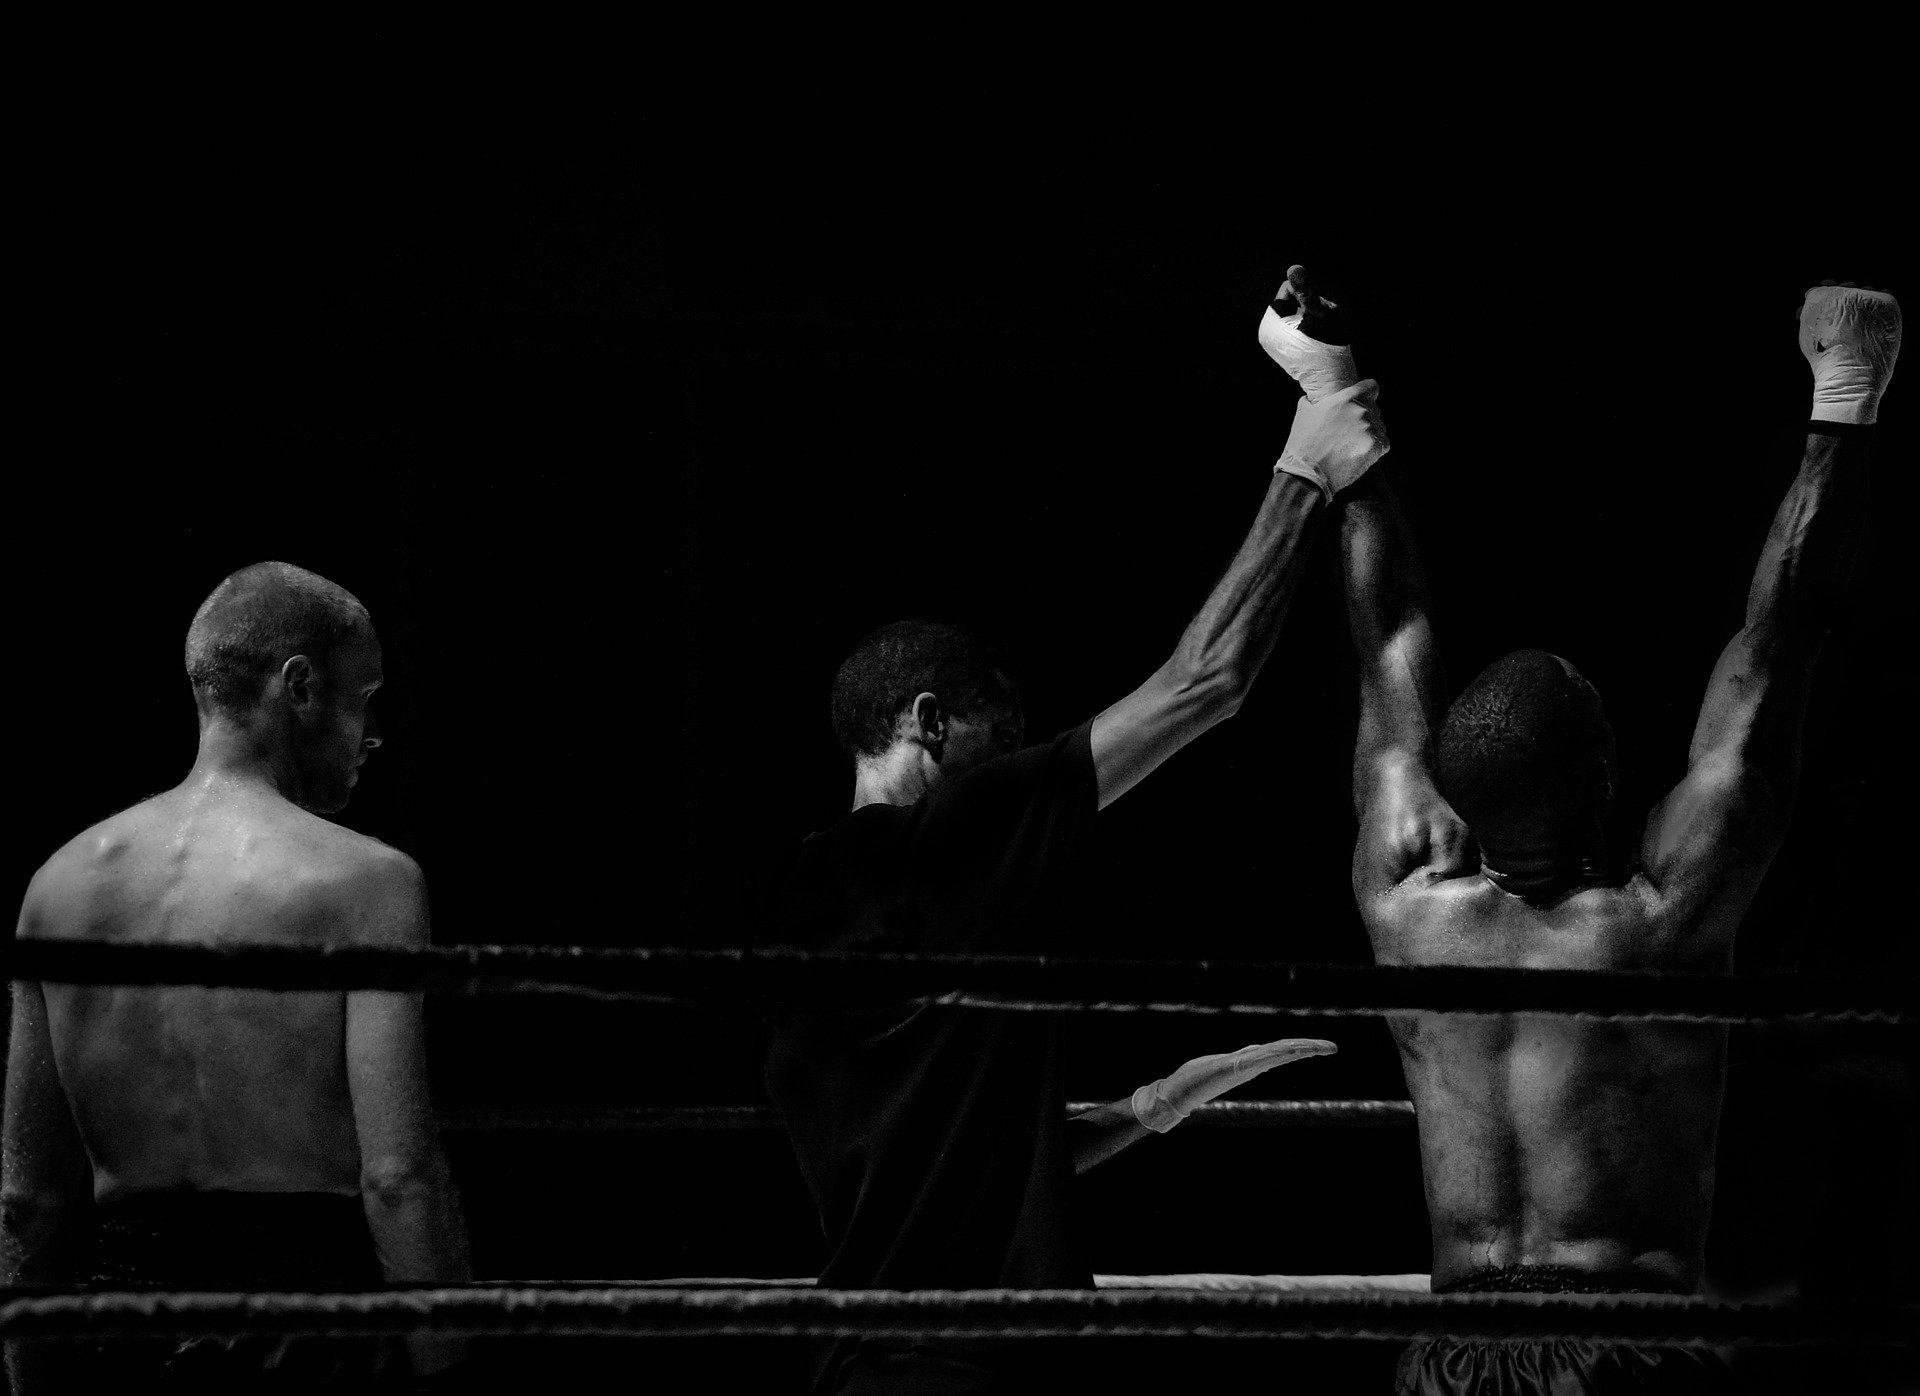 Kickboxing: Prevalence of injuries